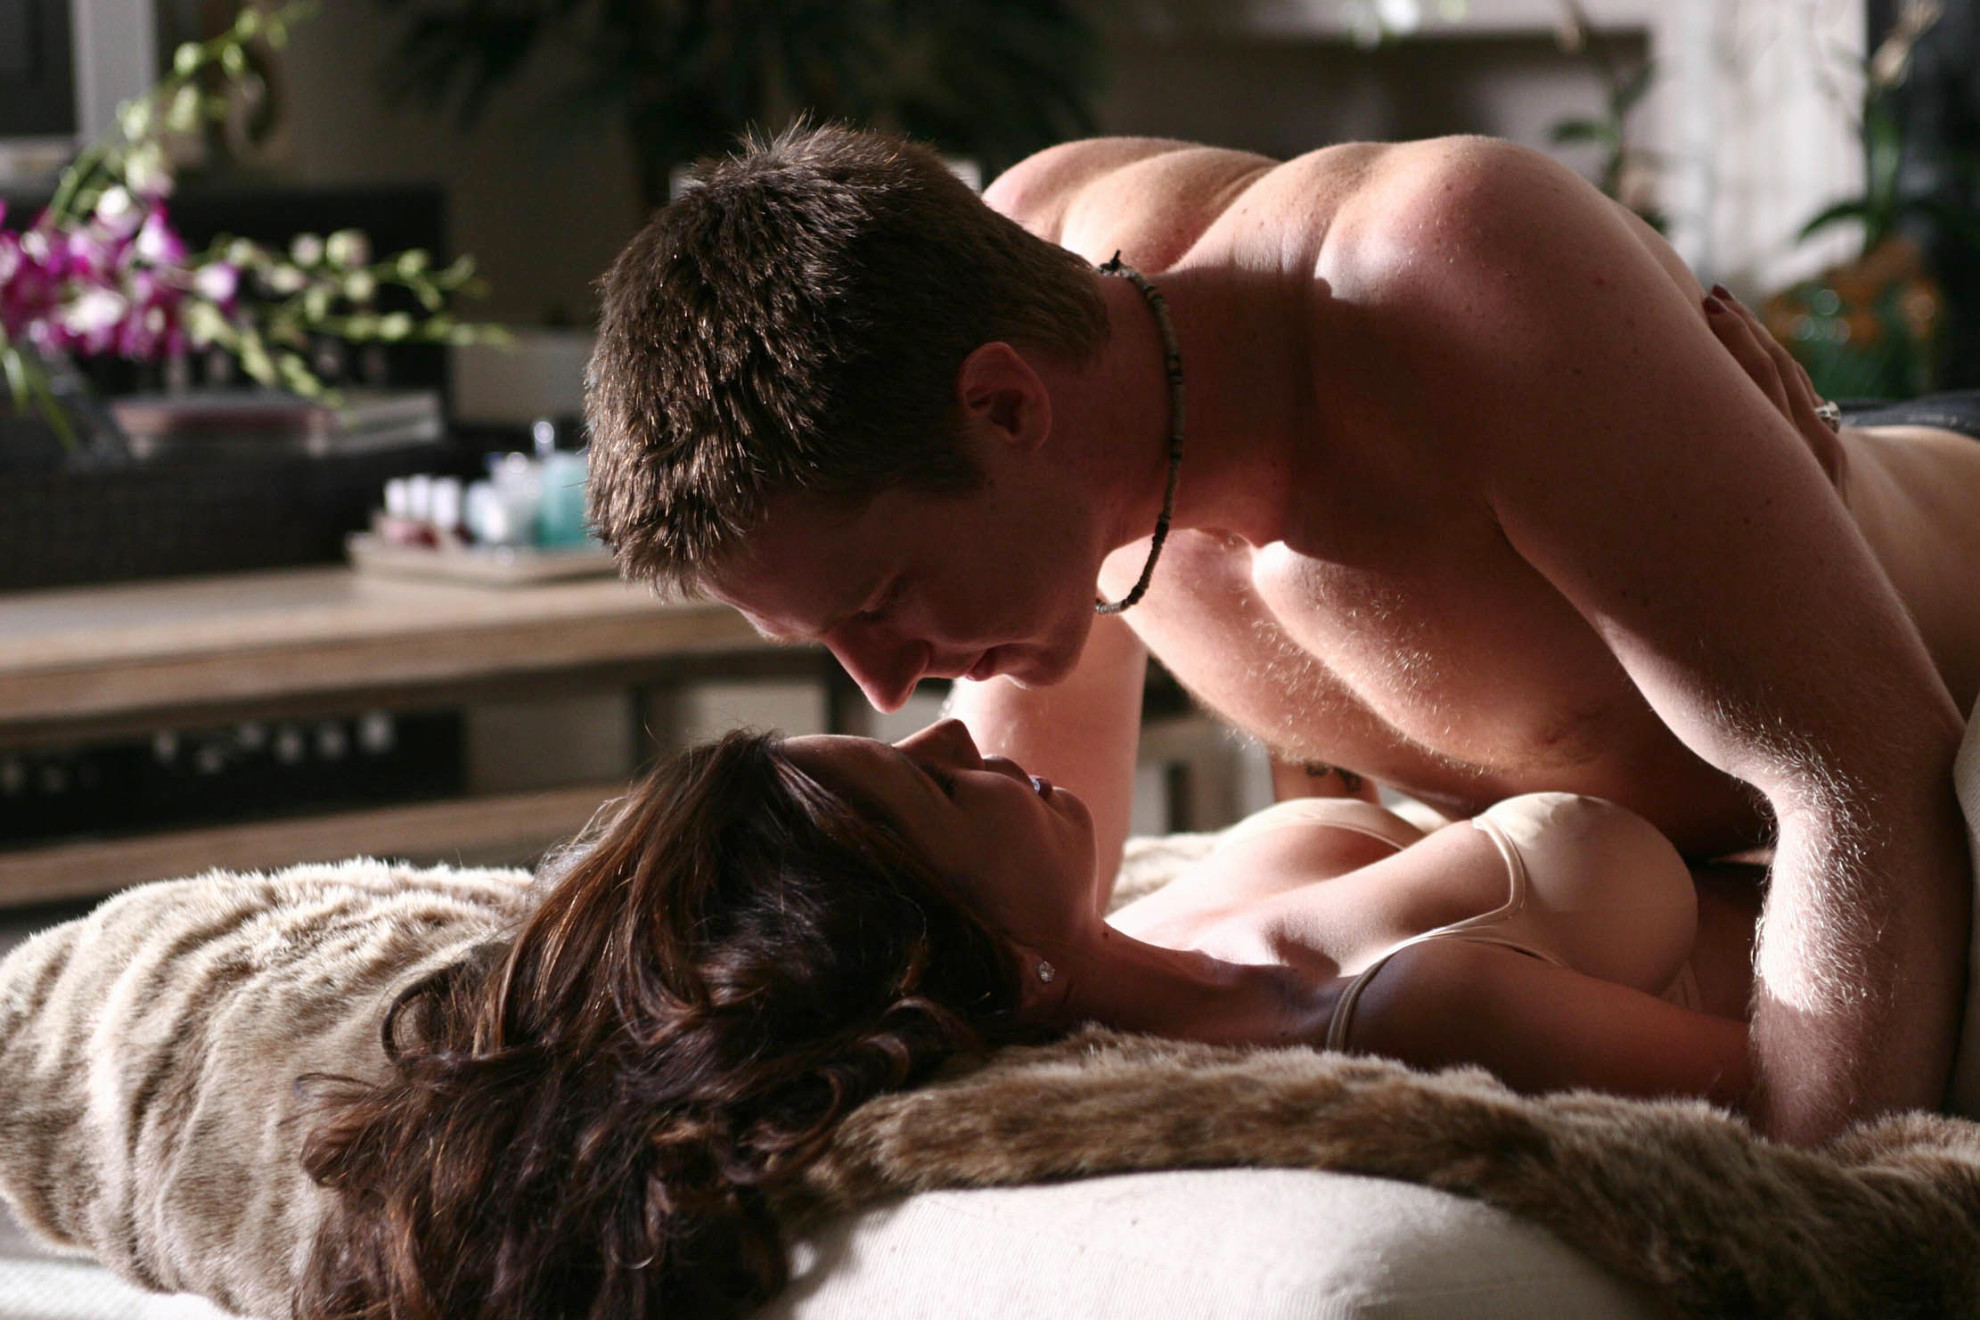 Erotic review romance